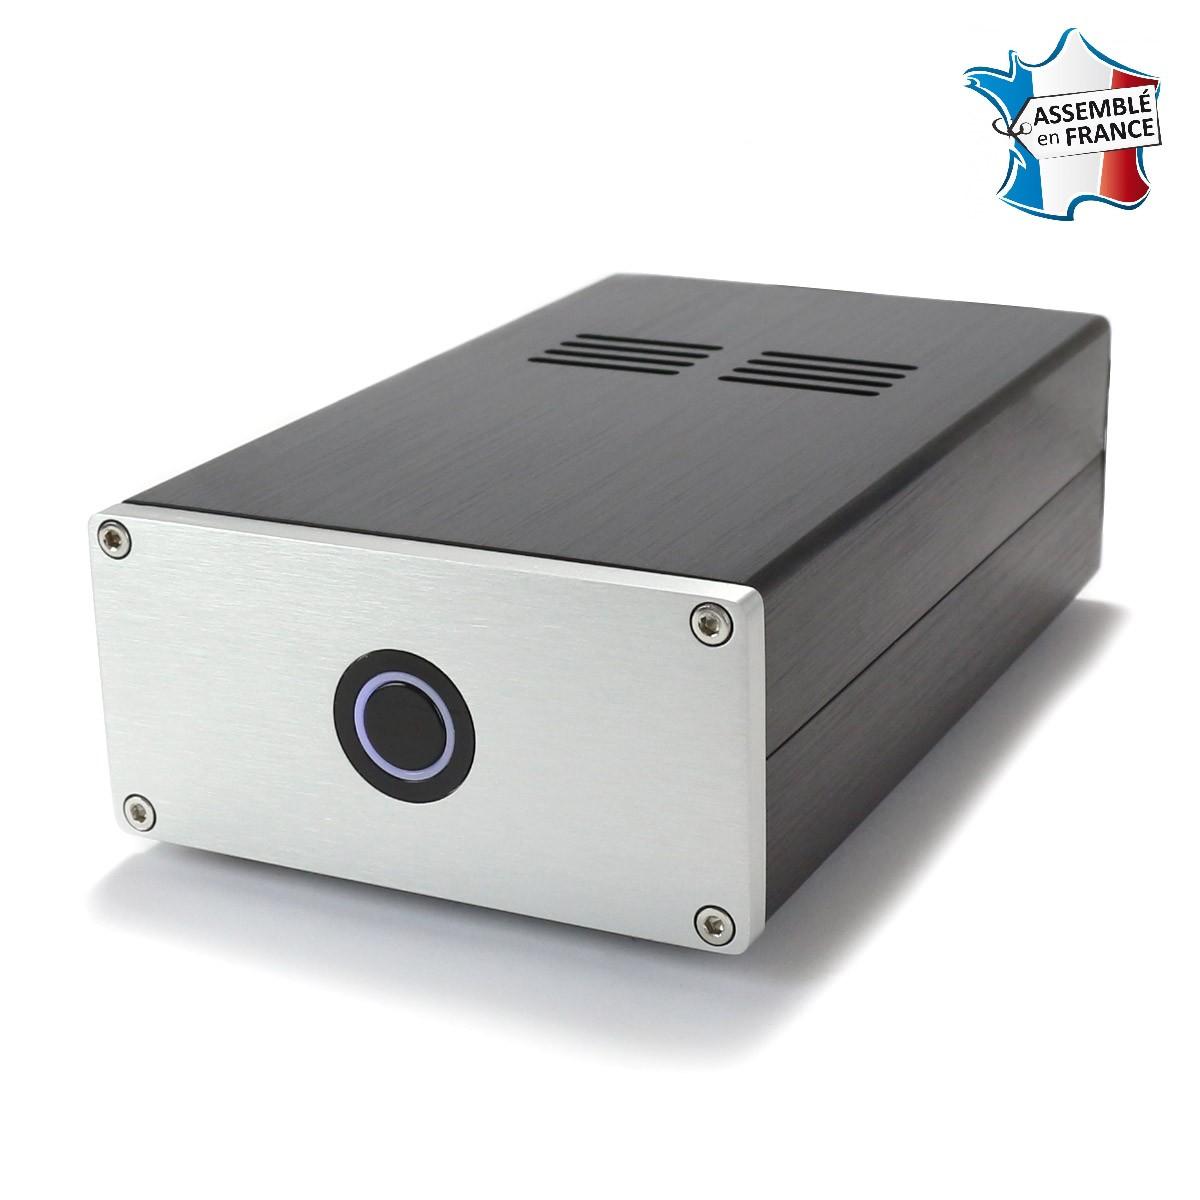 AUDIOPHONICS RaspDAC LTE I-Sabre V3 - Lecteur réseau Raspberry Pi & DAC TCXO